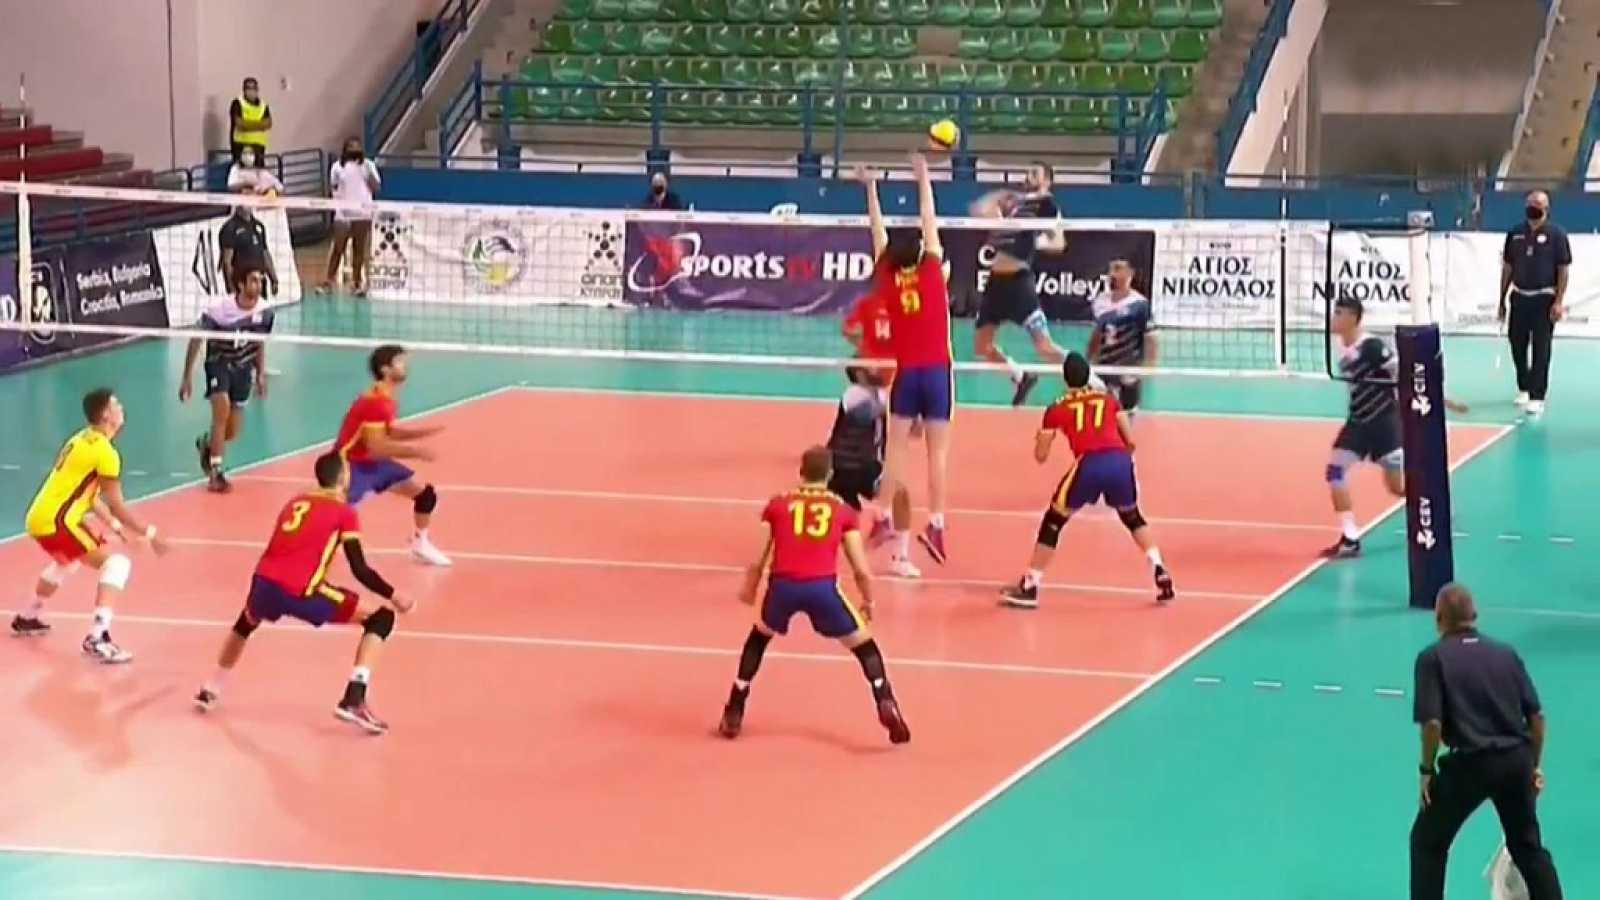 Voleibol - Clasificación Campeonato de Europa masculino: Chipre - España. Desde Nicosia (Chipre) - ver ahora